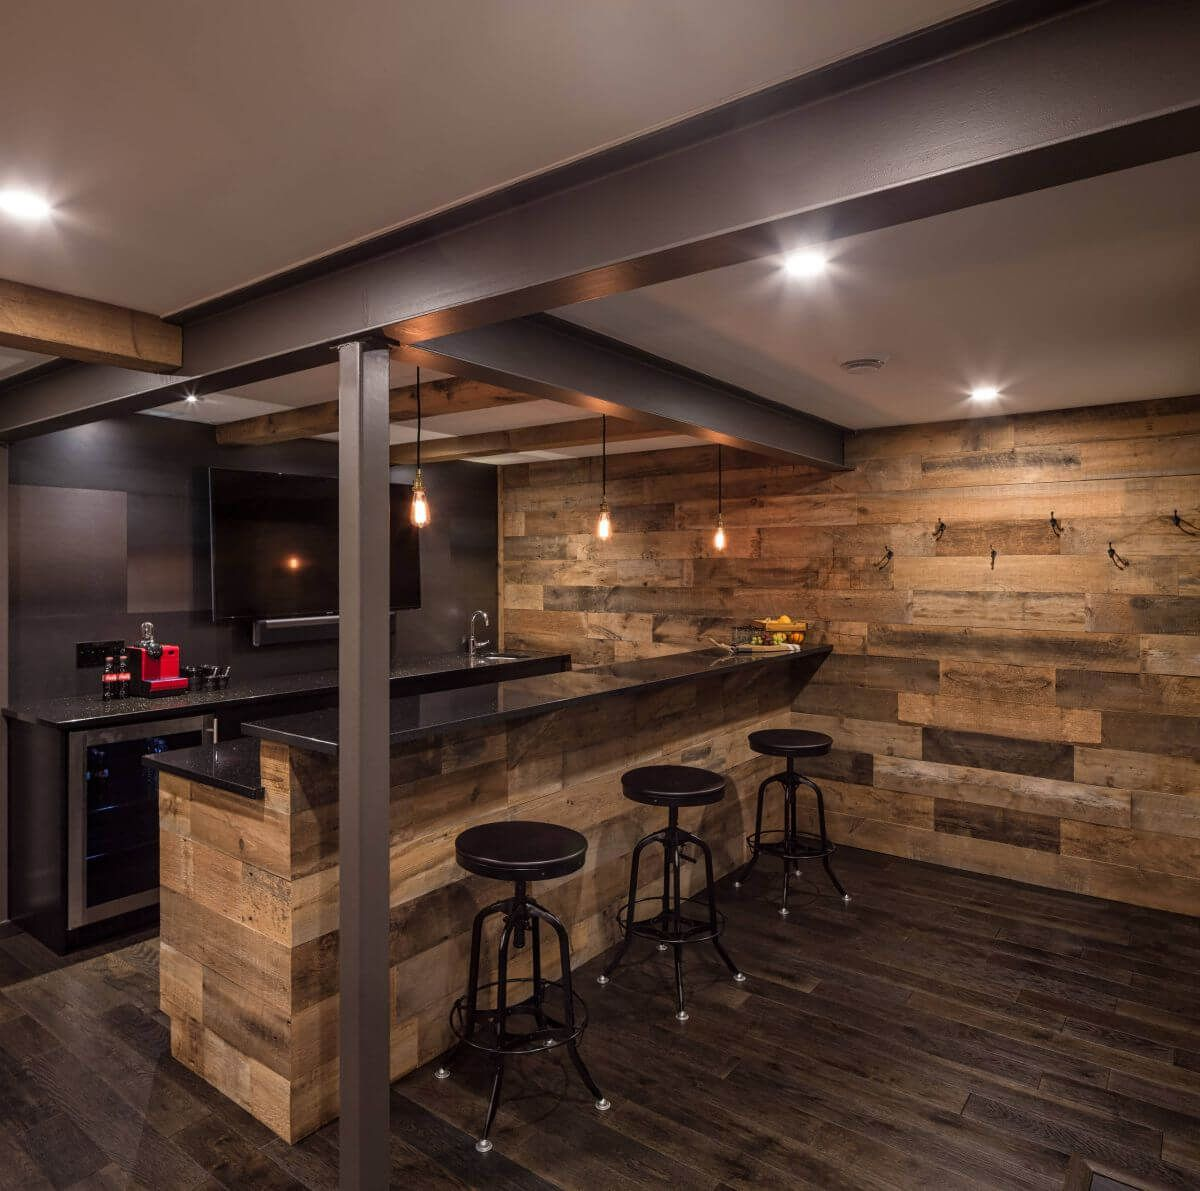 How To Build A Basement Bar Rustic Basement Bar Building A Basement Basement Bar Designs